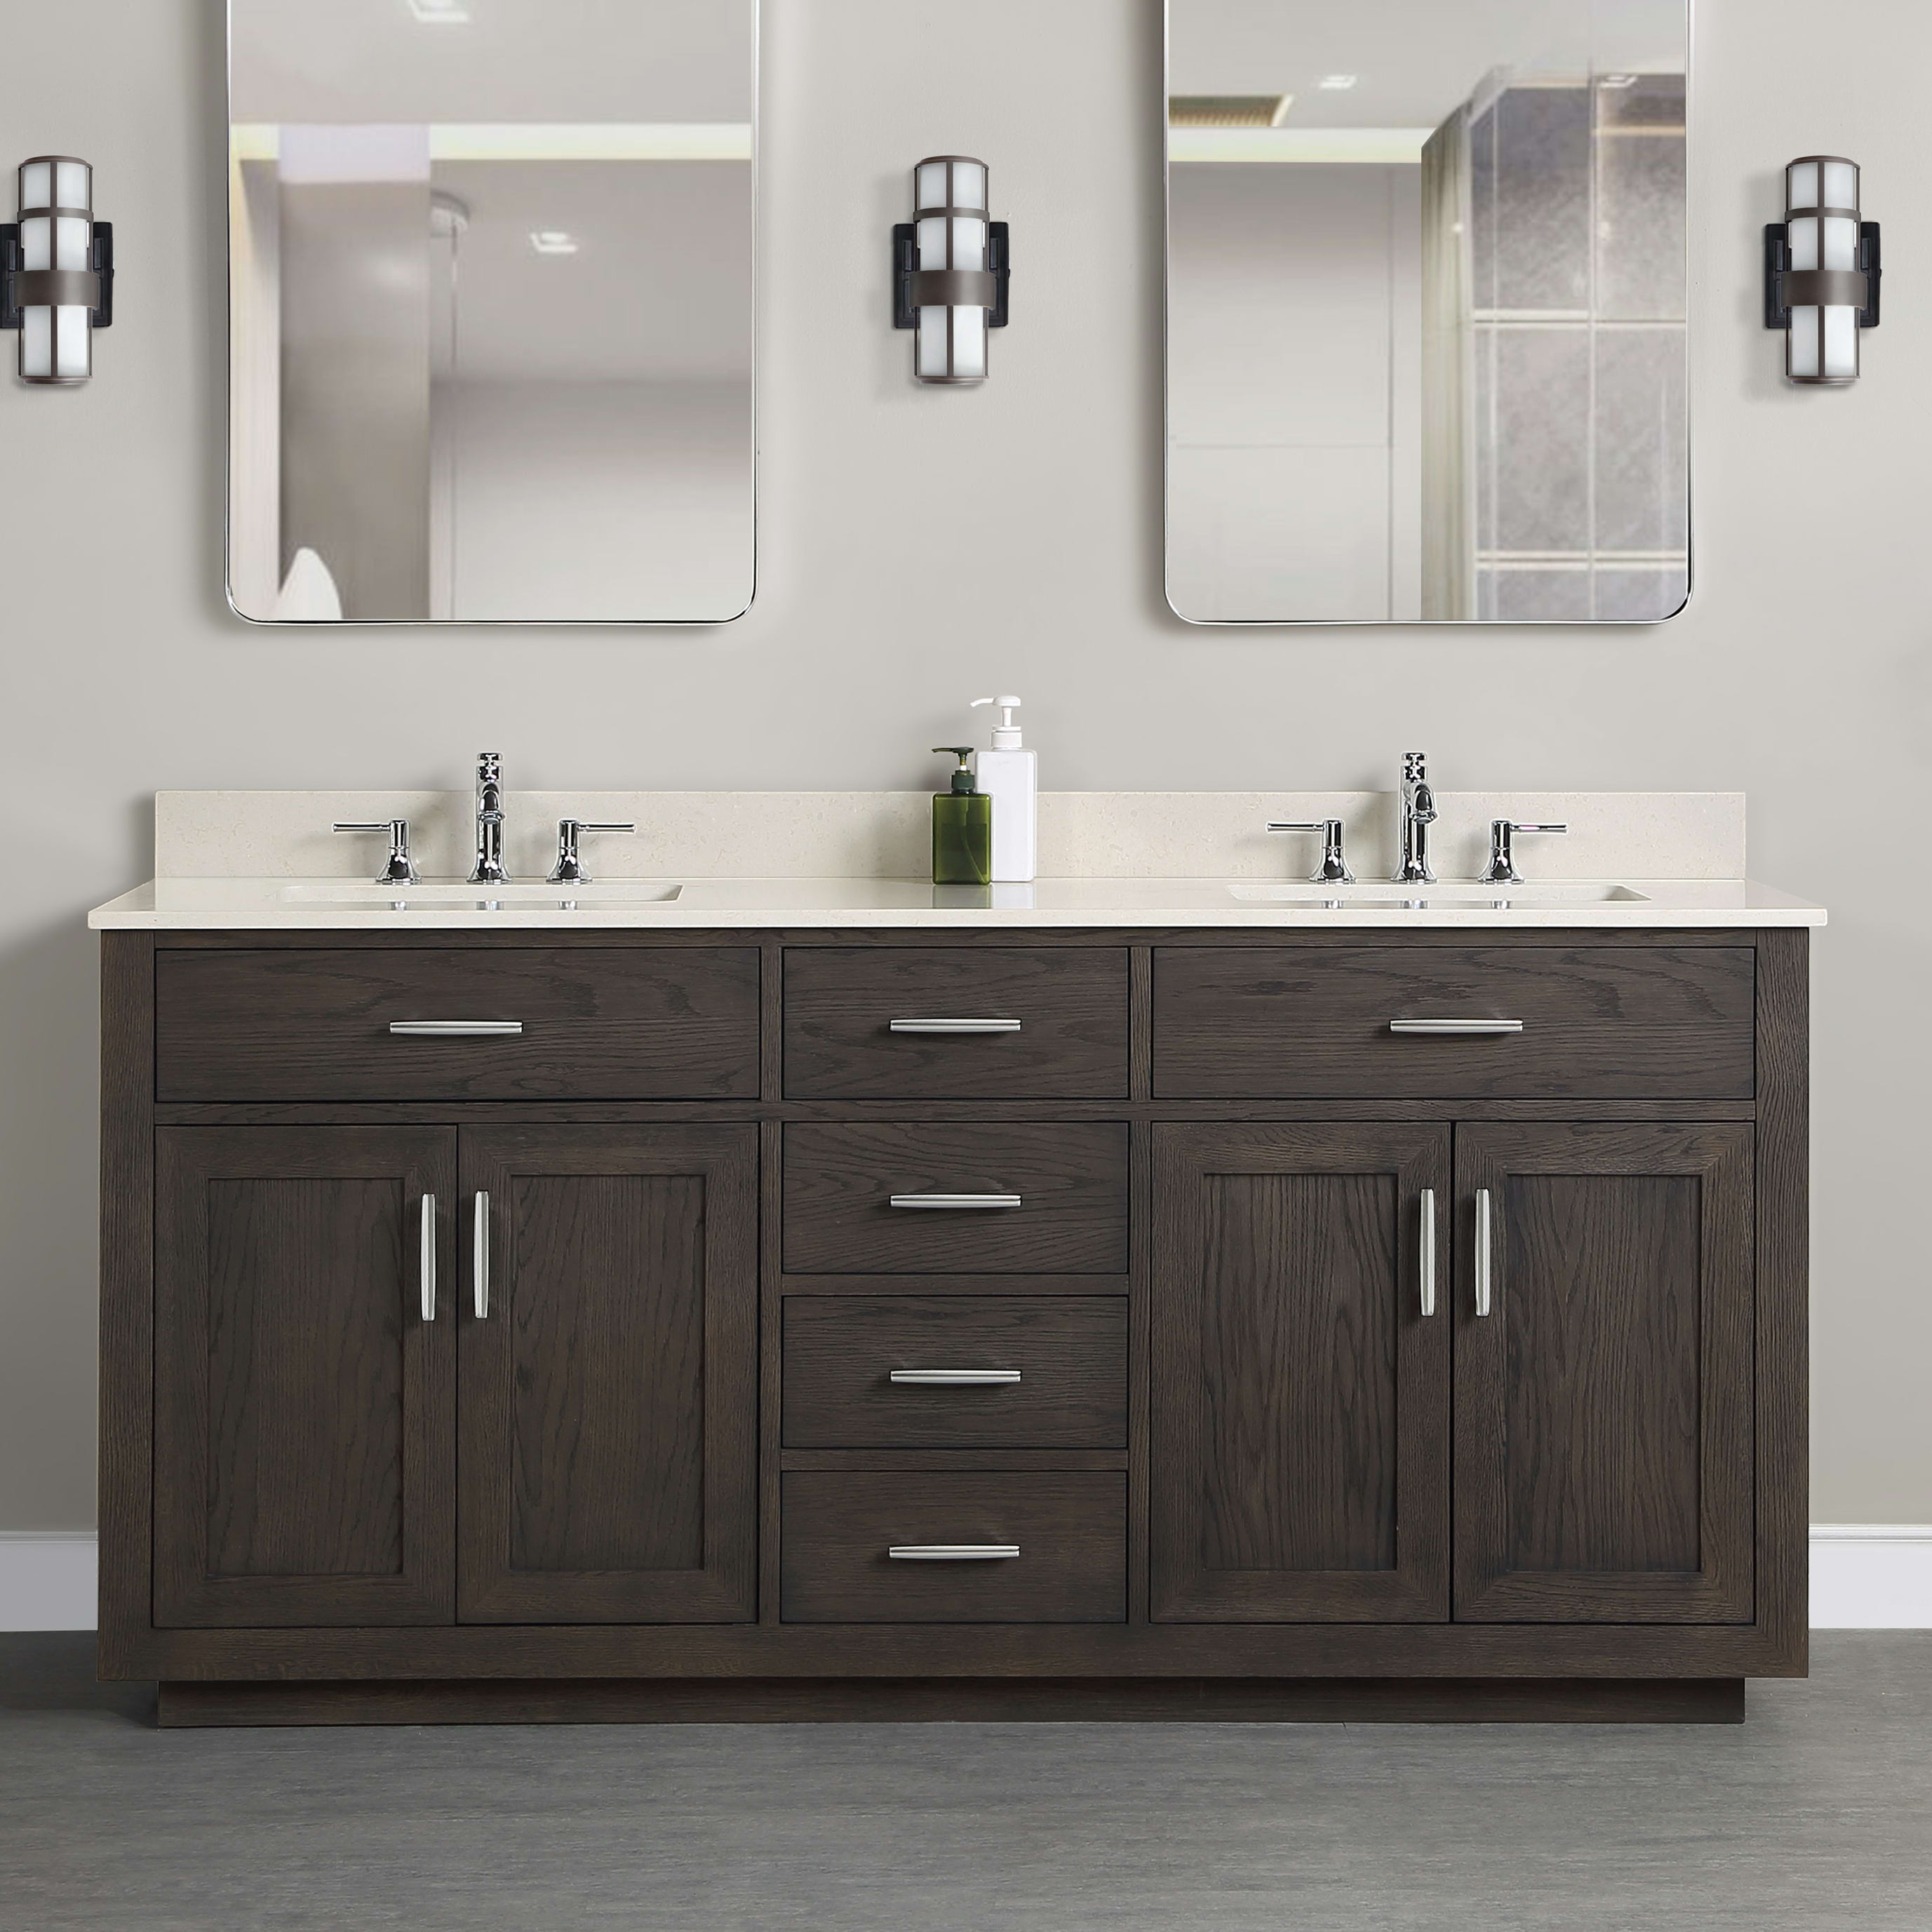 Fairmont Designs 1552 V7221d Brookings 72 Bathroom Vanity Qualitybath Com